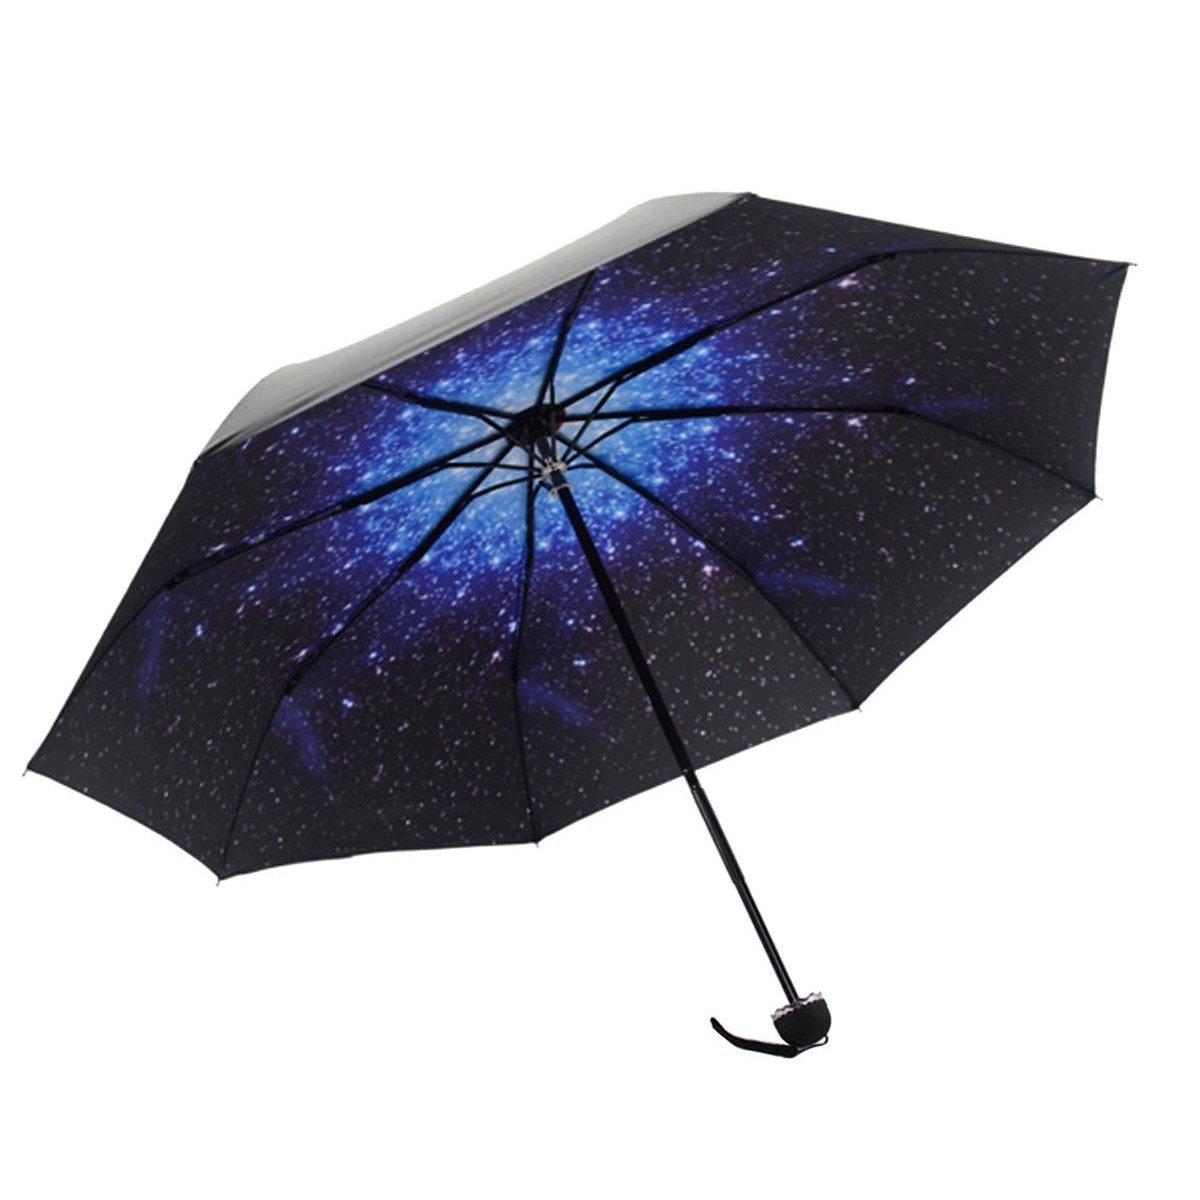 Sumdreams Starry Night Automatic Folding Umbrella Windproof Anti UV Rain Sun Umbrella